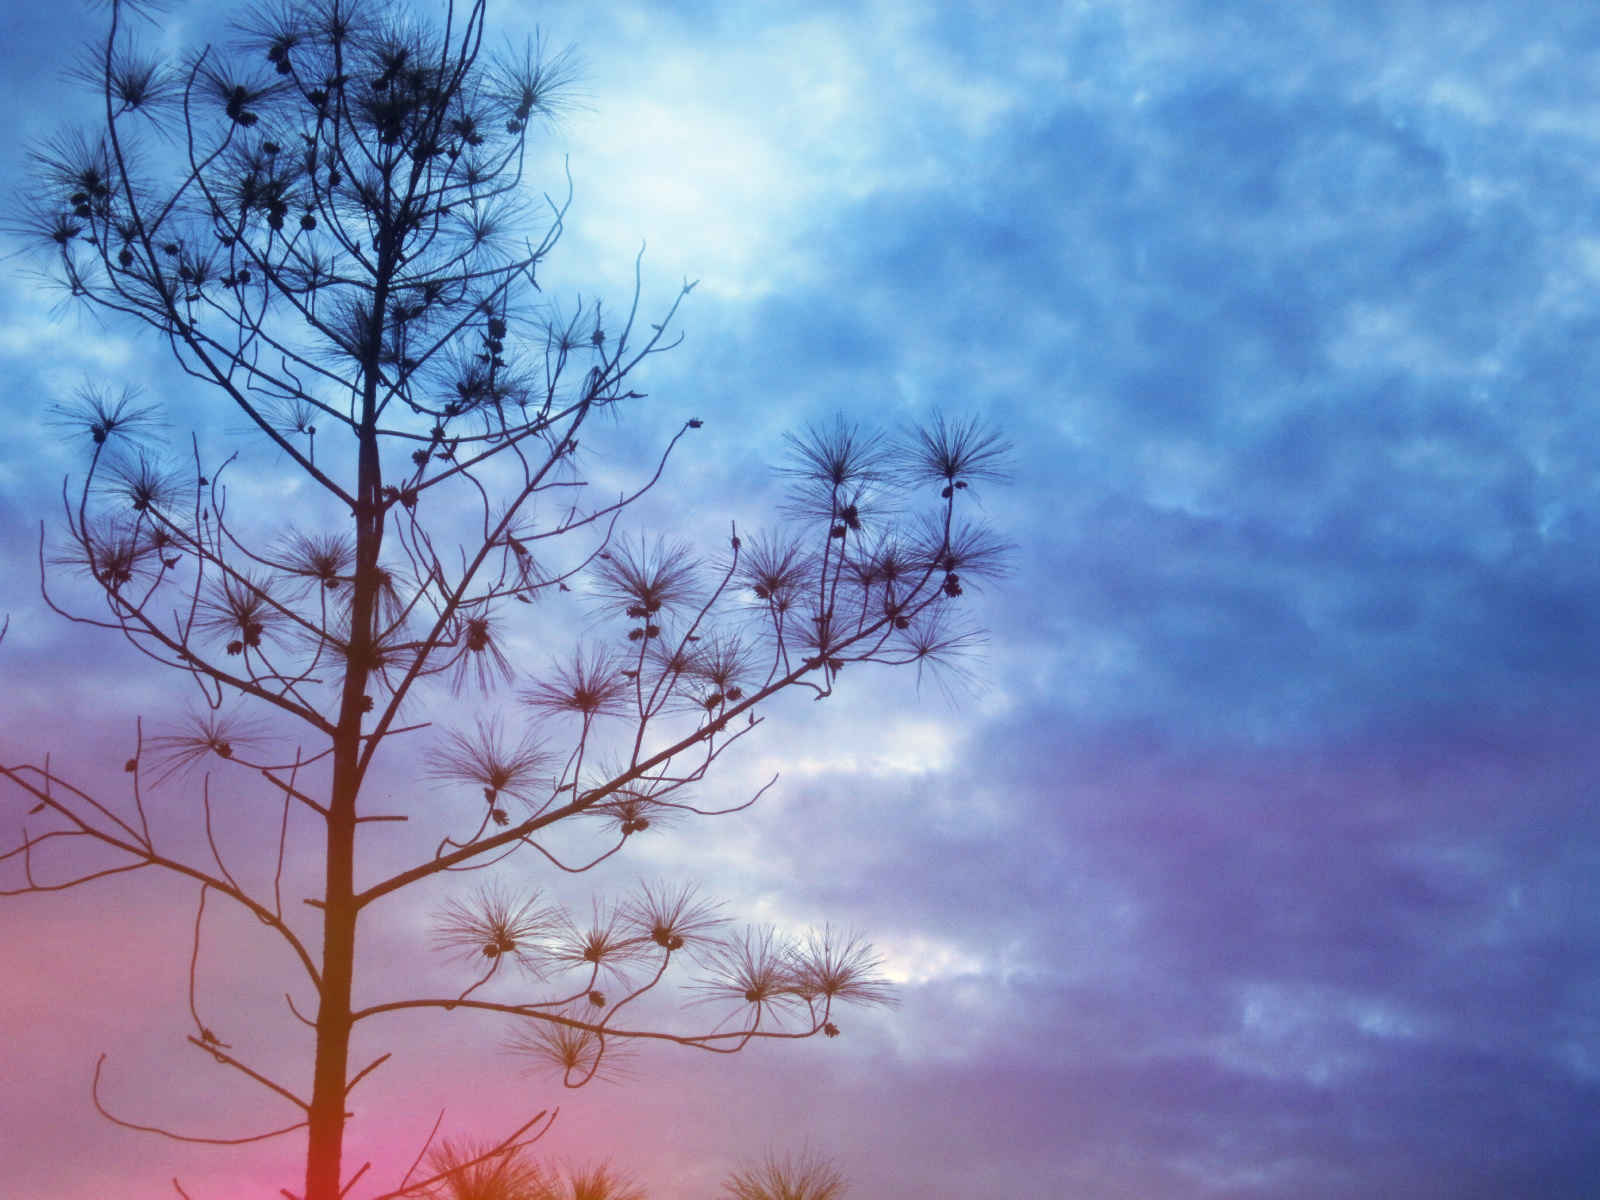 Lavender Dome Januari 2012